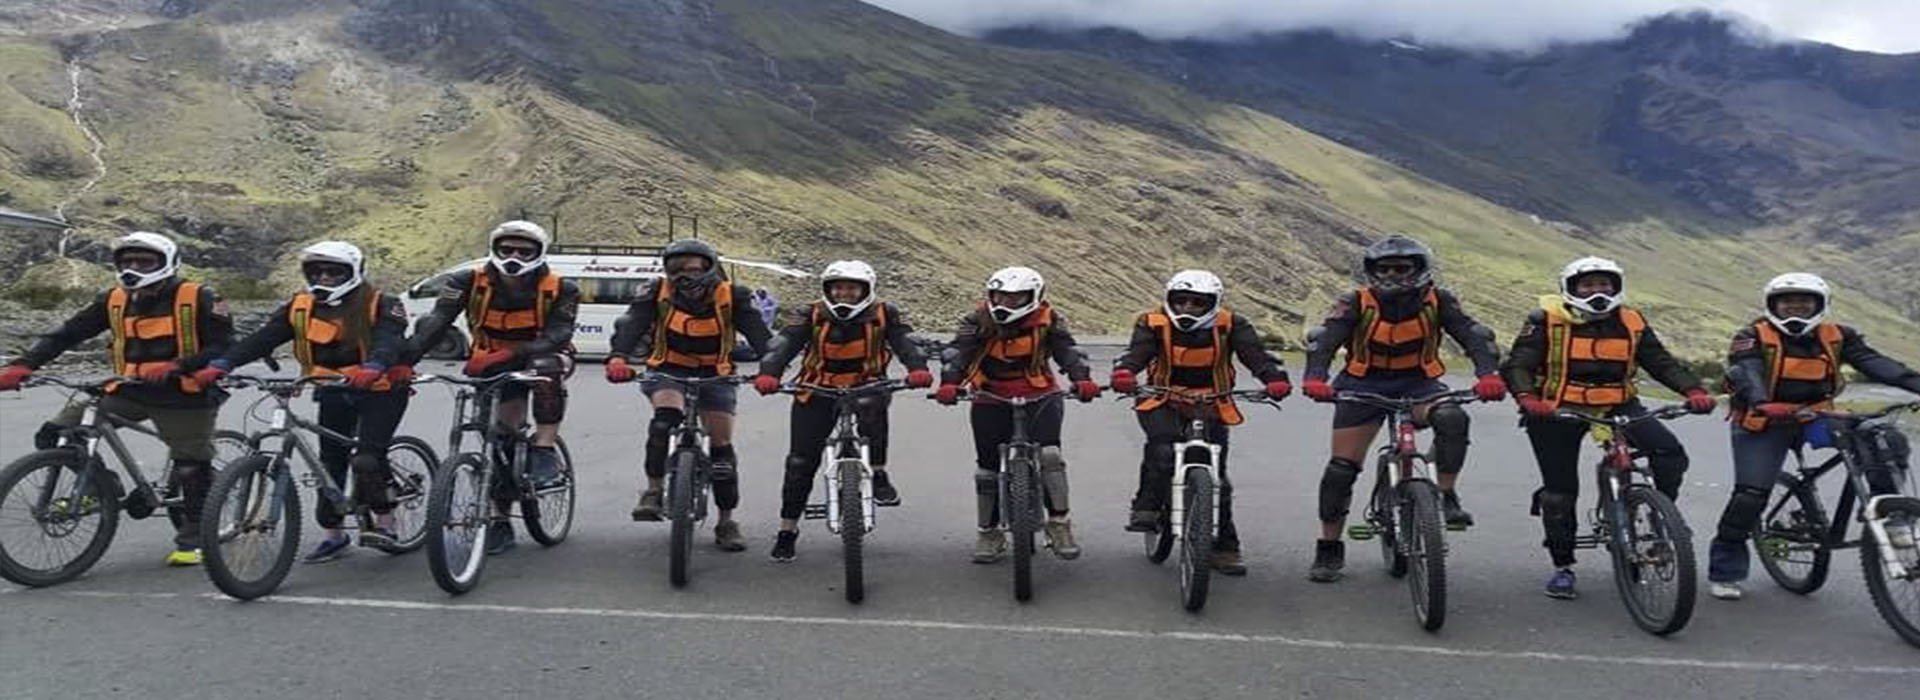 Inka Jungle Trek to Machu Picchu 3 days return by train last day